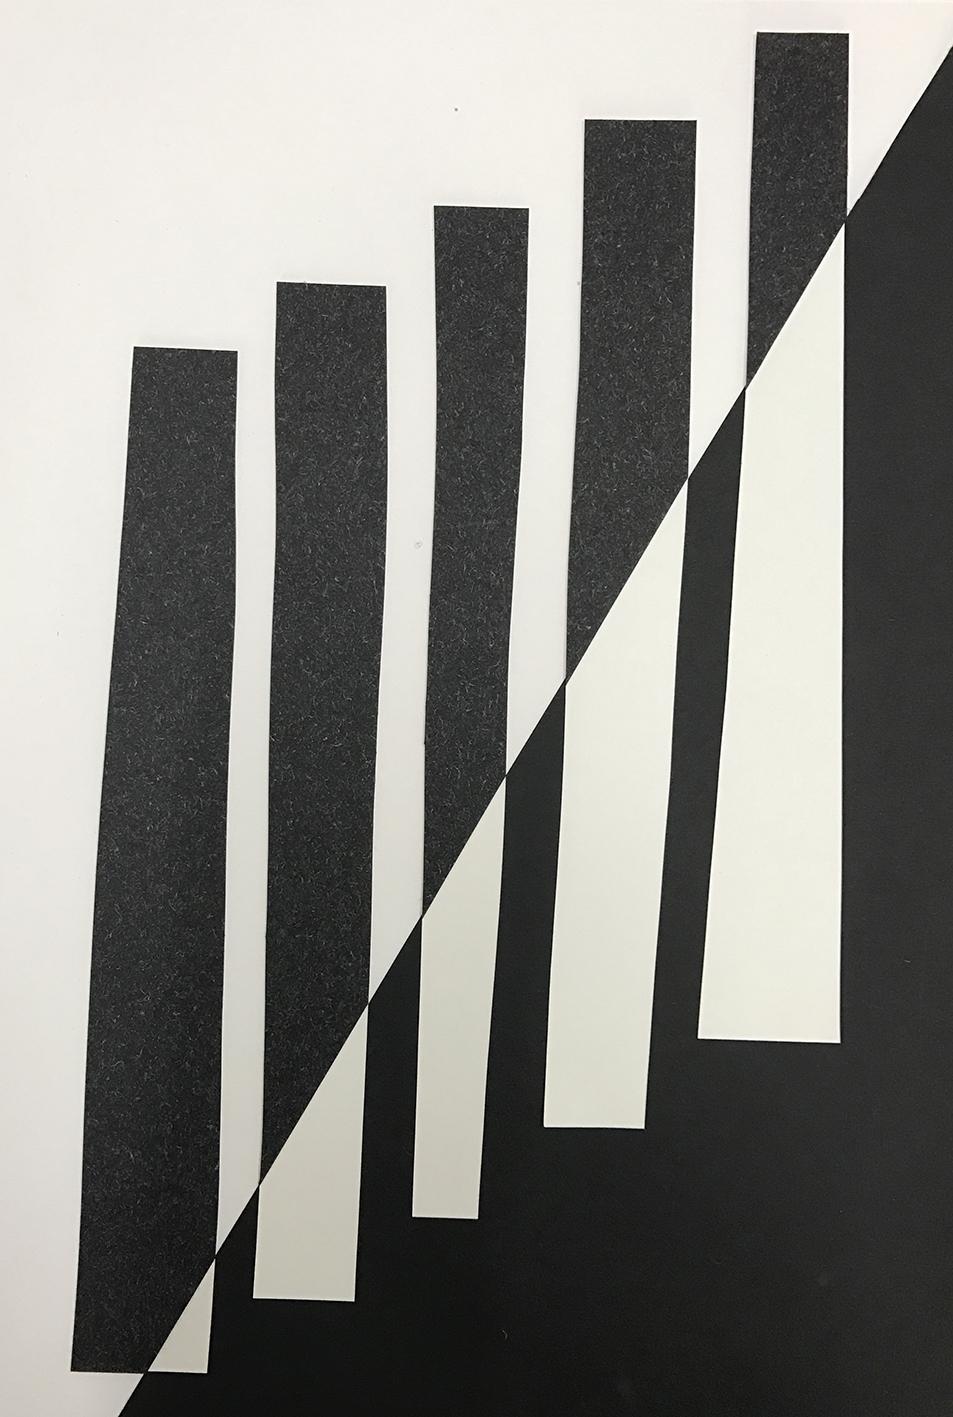 Weaving & Architecture 6 (Emma Wood)